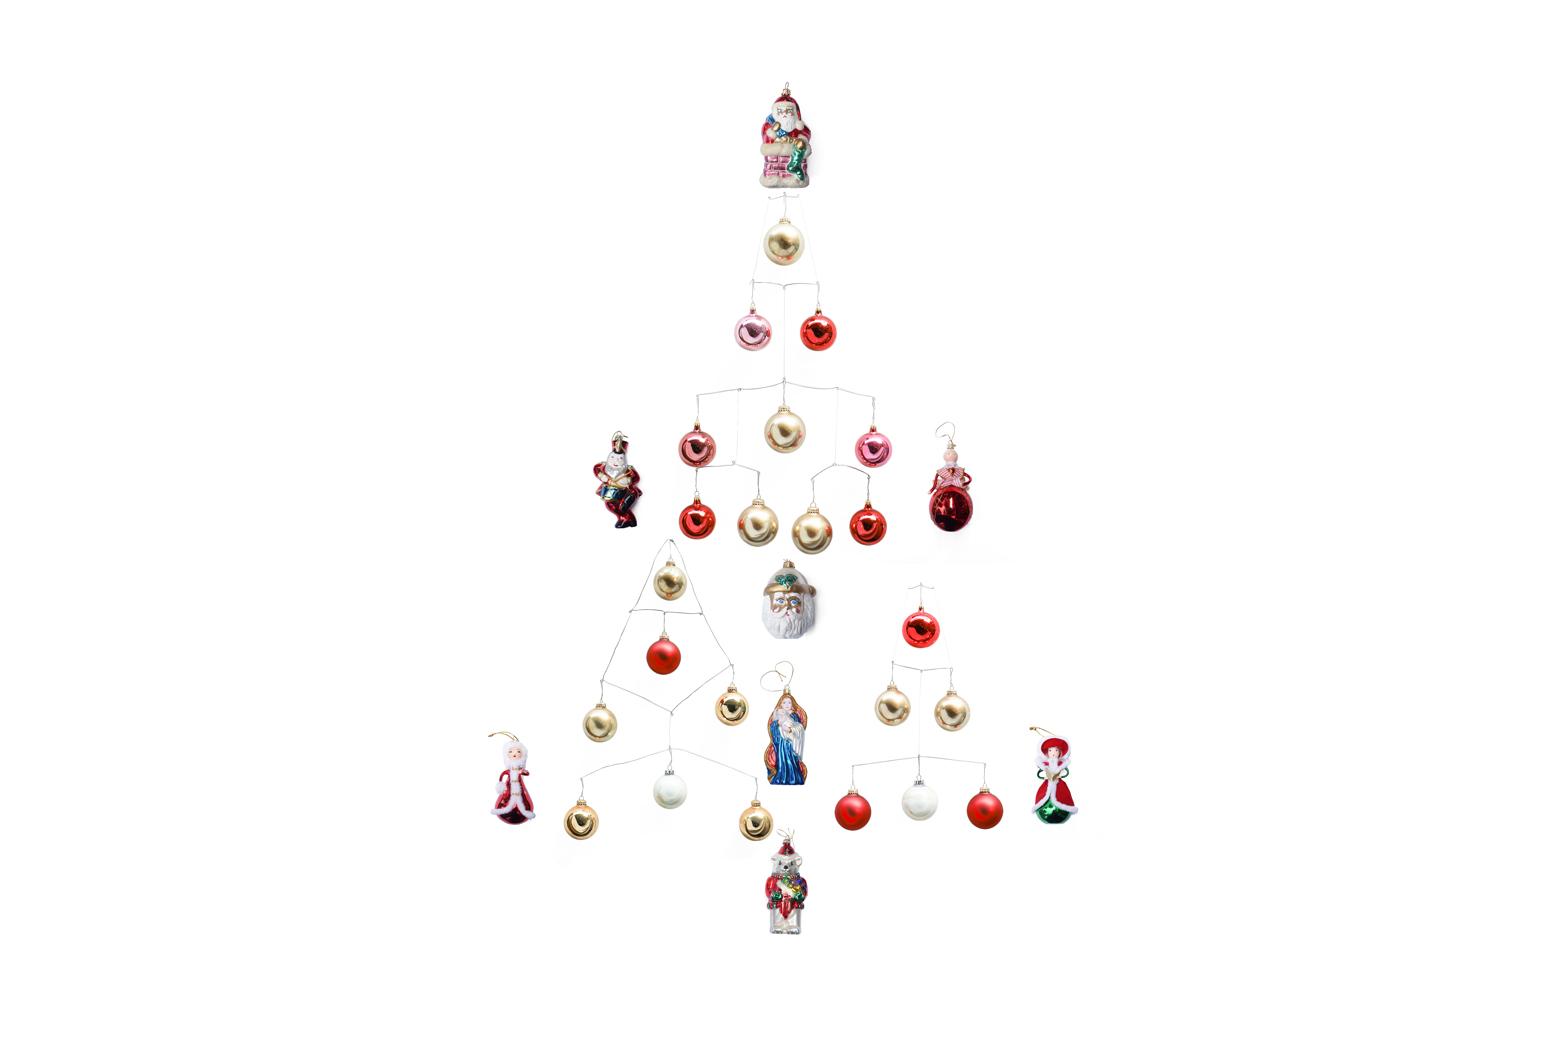 Vintage Blown Glass Christmas Ornament/ヴィンテージ クリスマス オーナメント 吹きガラス レトロ